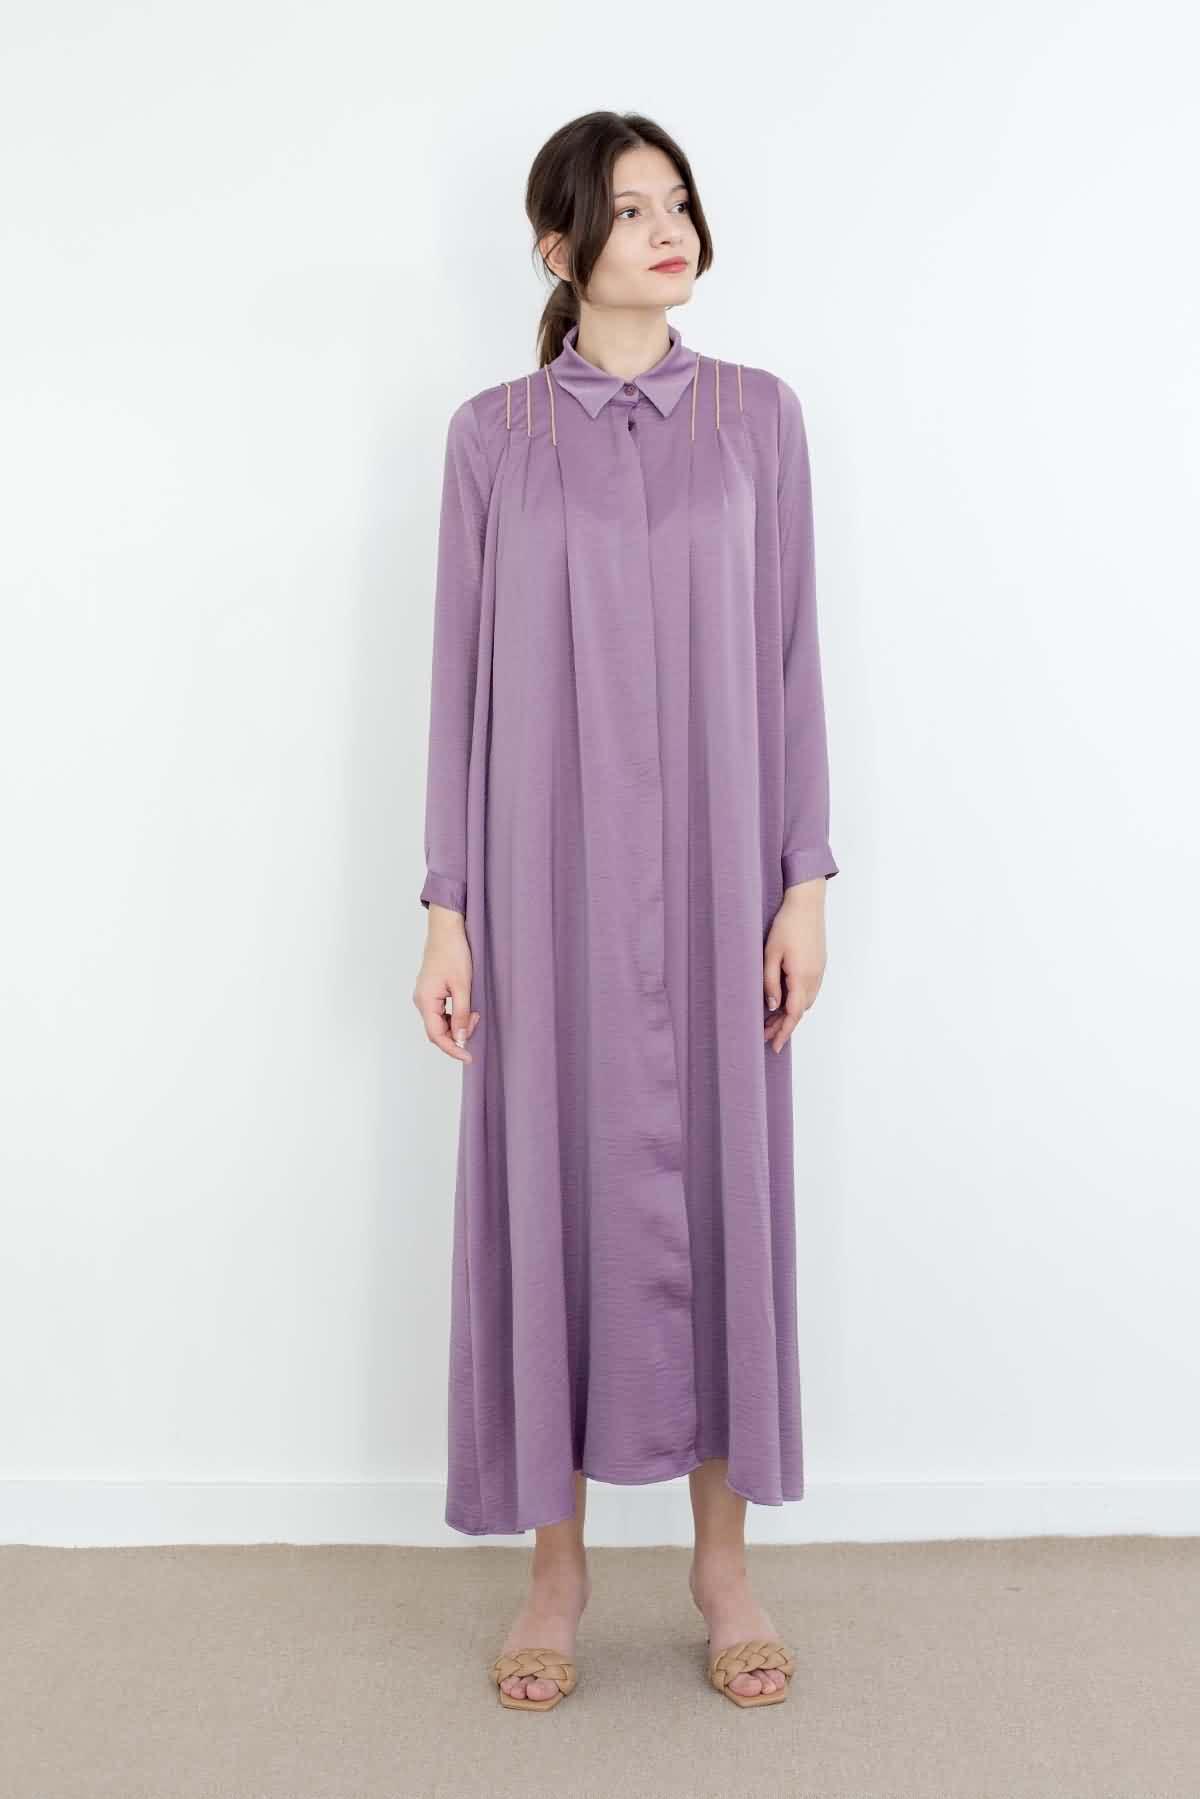 Mevra - Omzu Pileli Elbise Lavanta